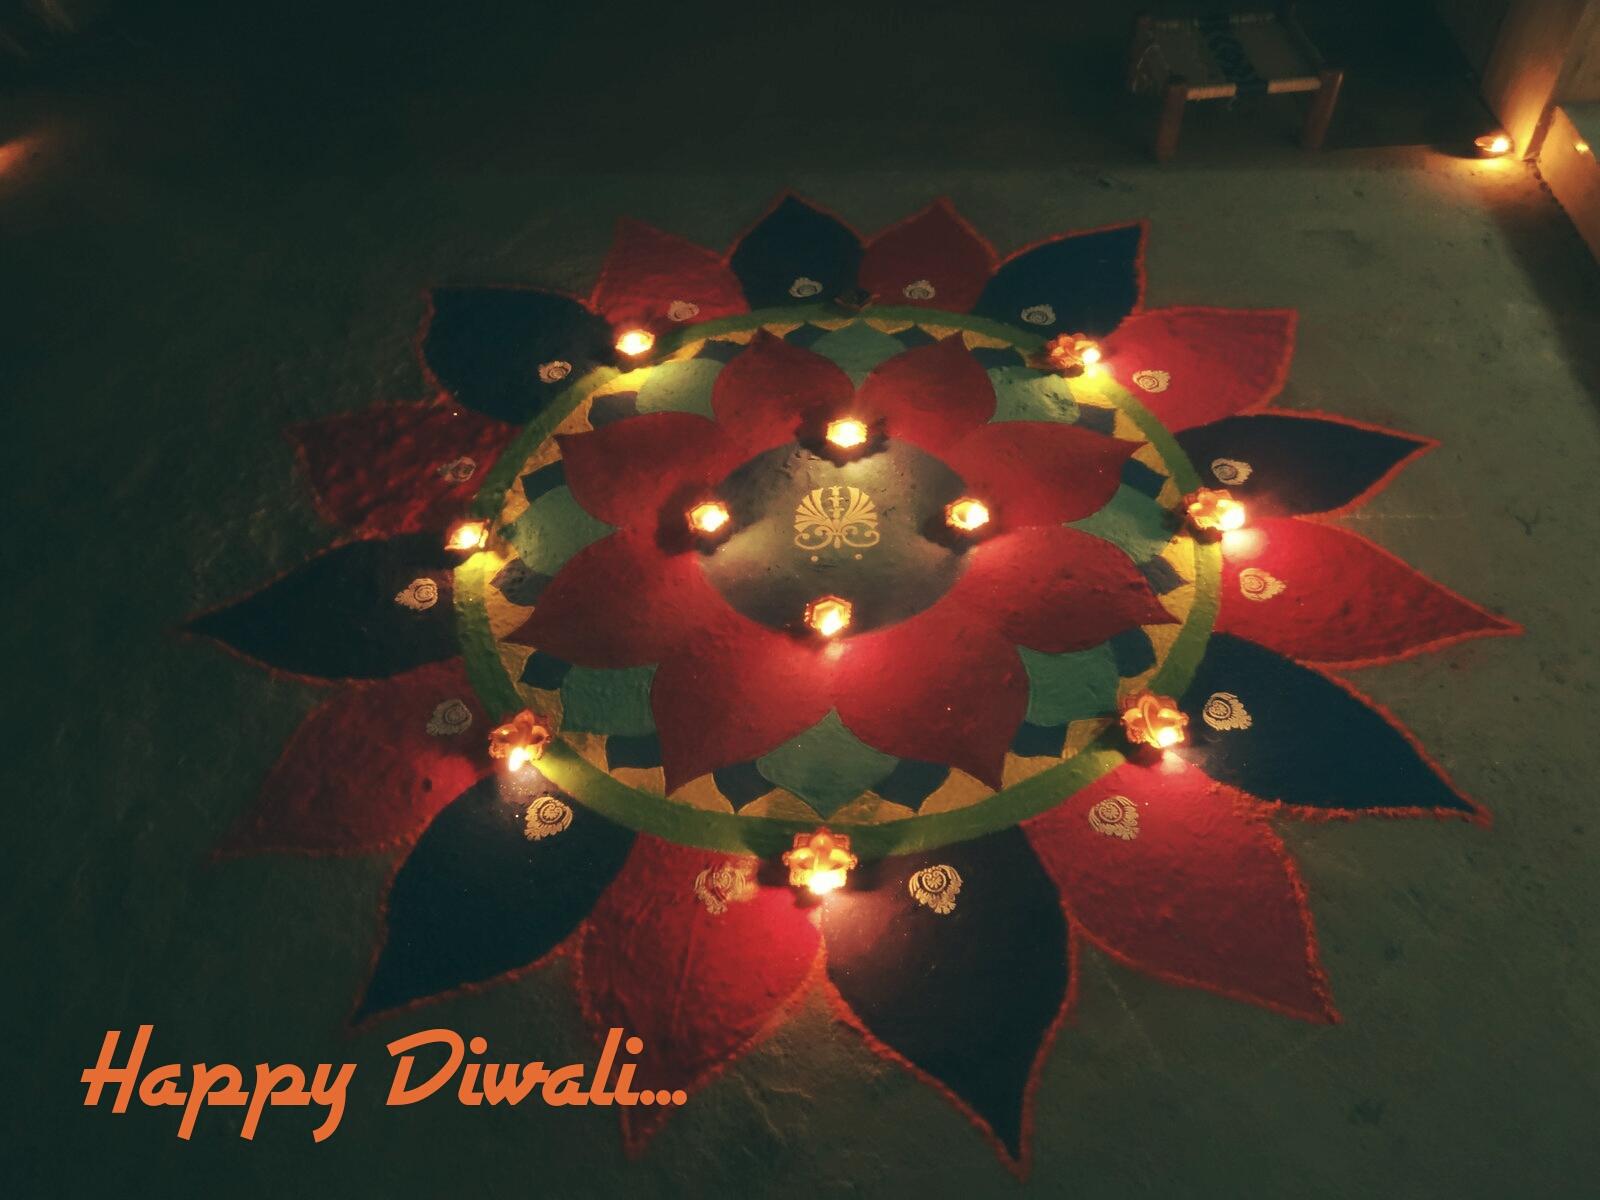 Happy Diwali HD Wallpaper for free - Simple Rangoli Design for Diwali